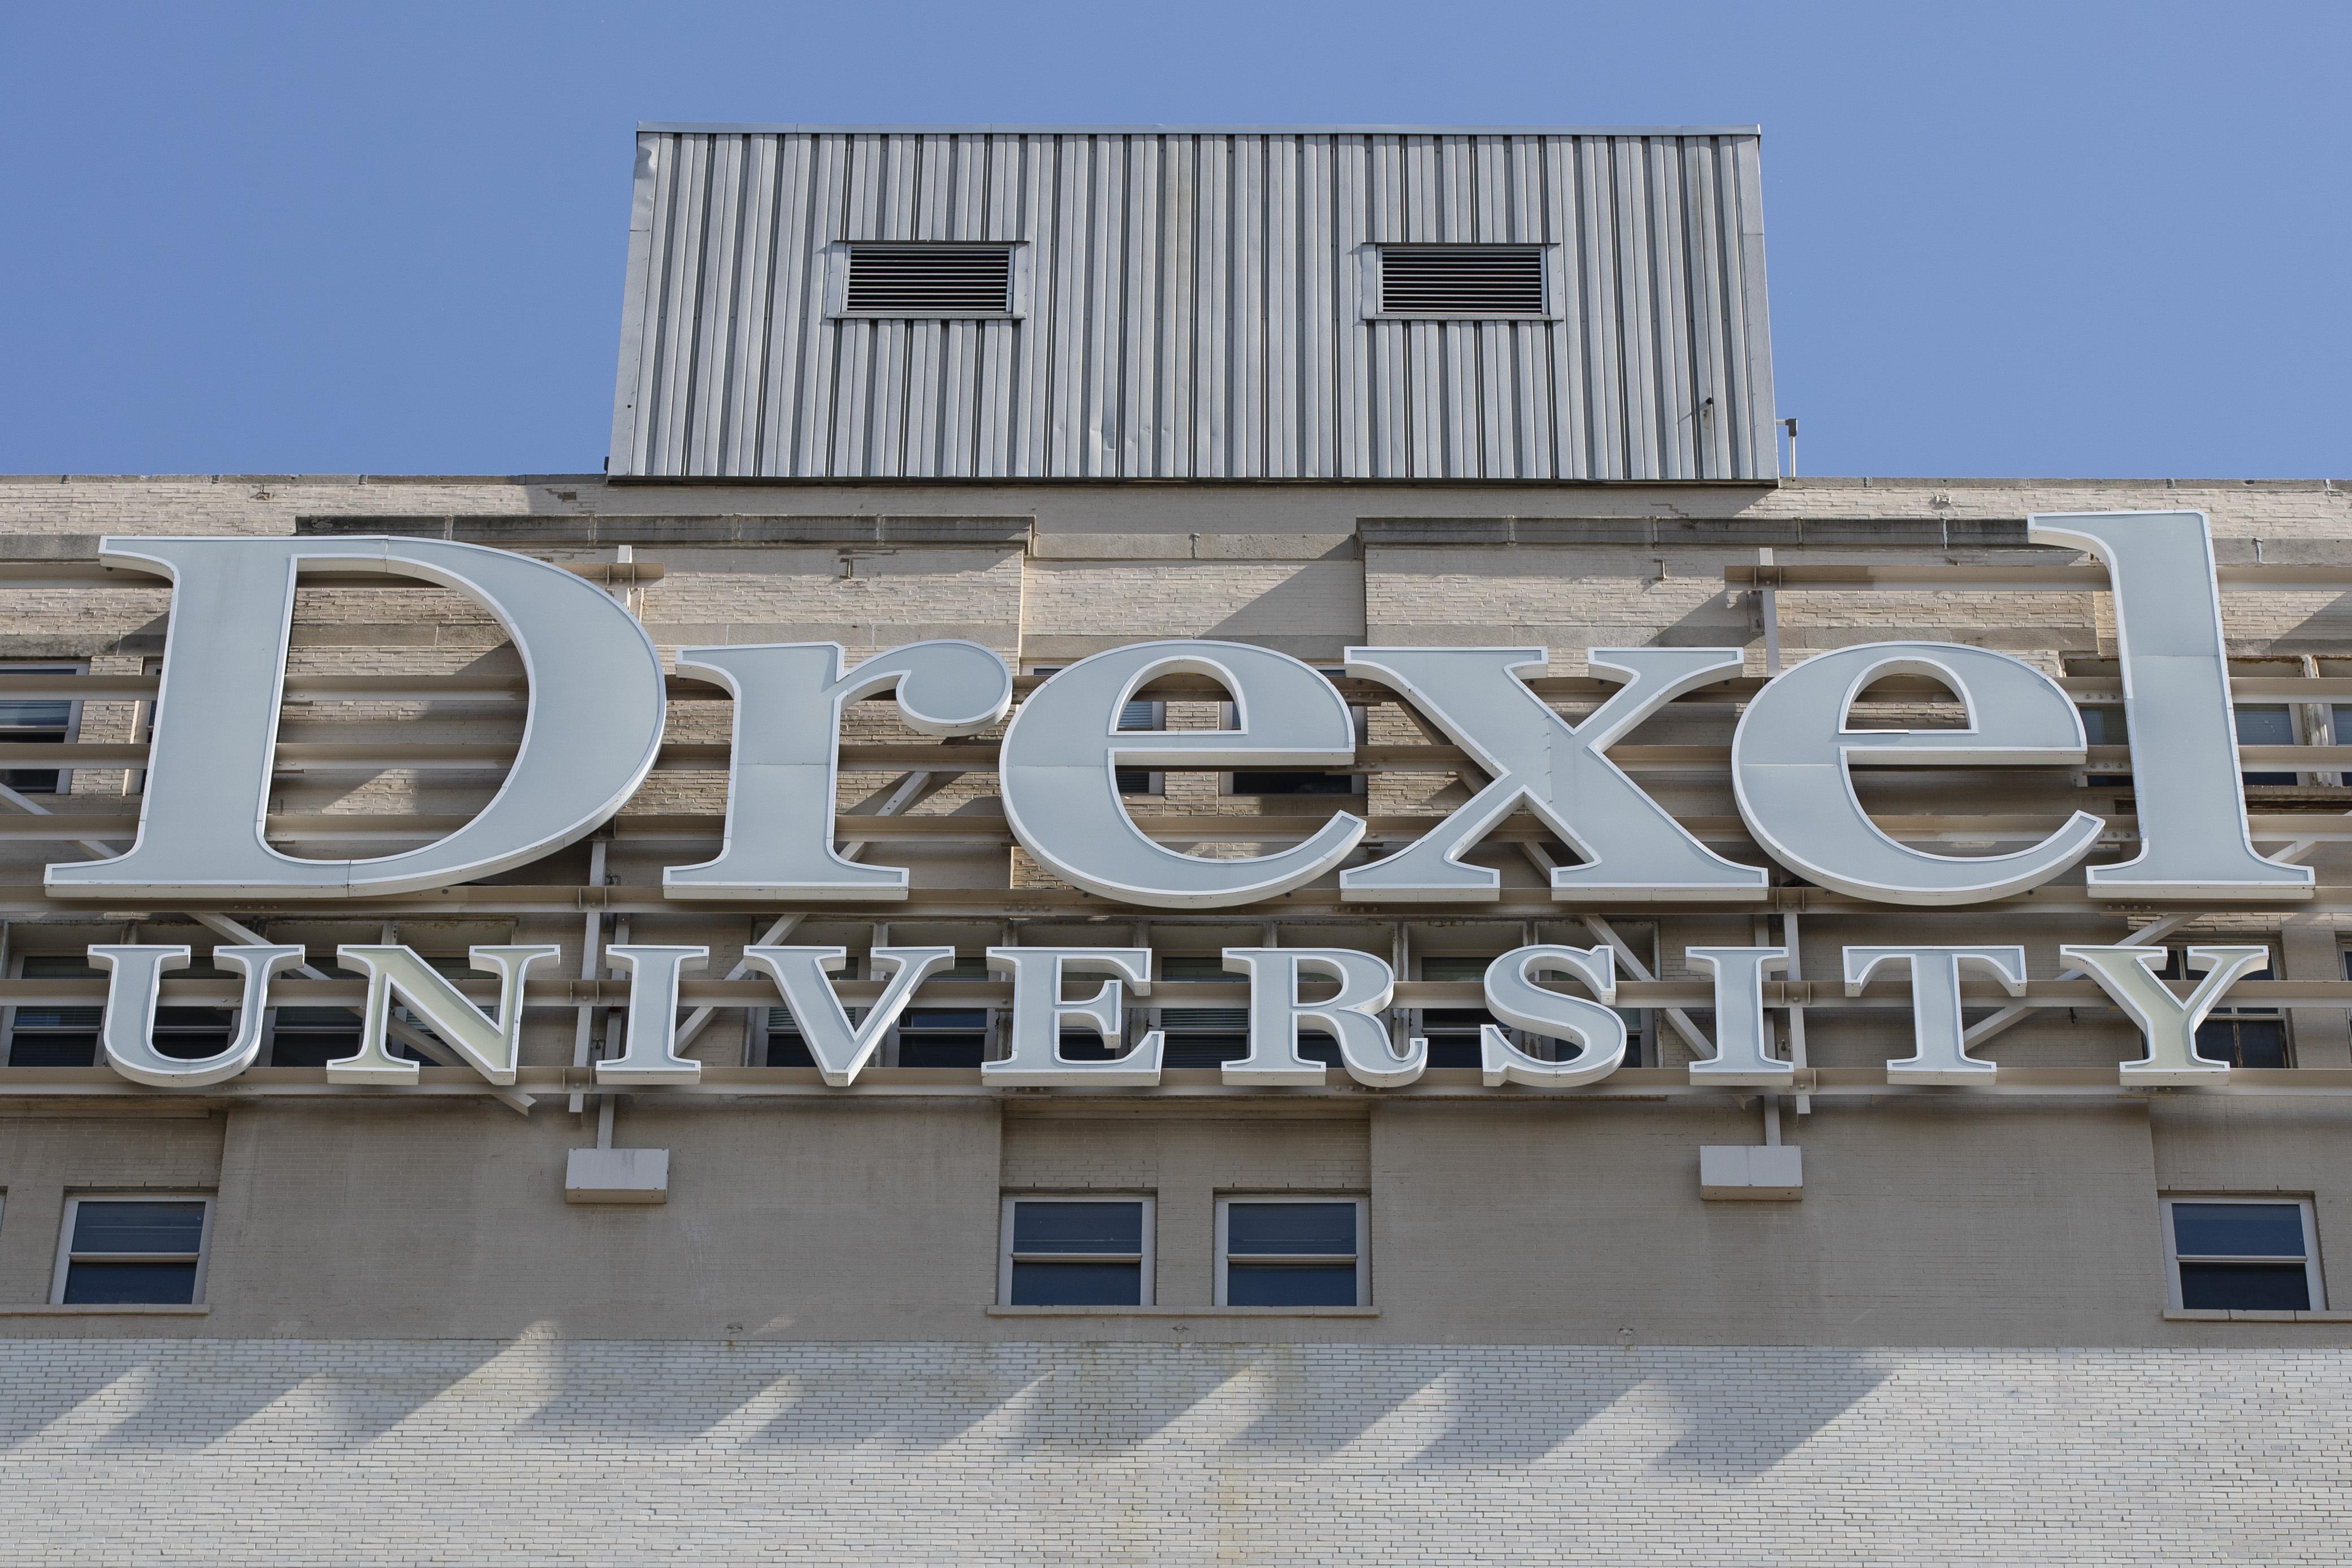 Drexel professor spent federal grants at strip clubs: prosecutor